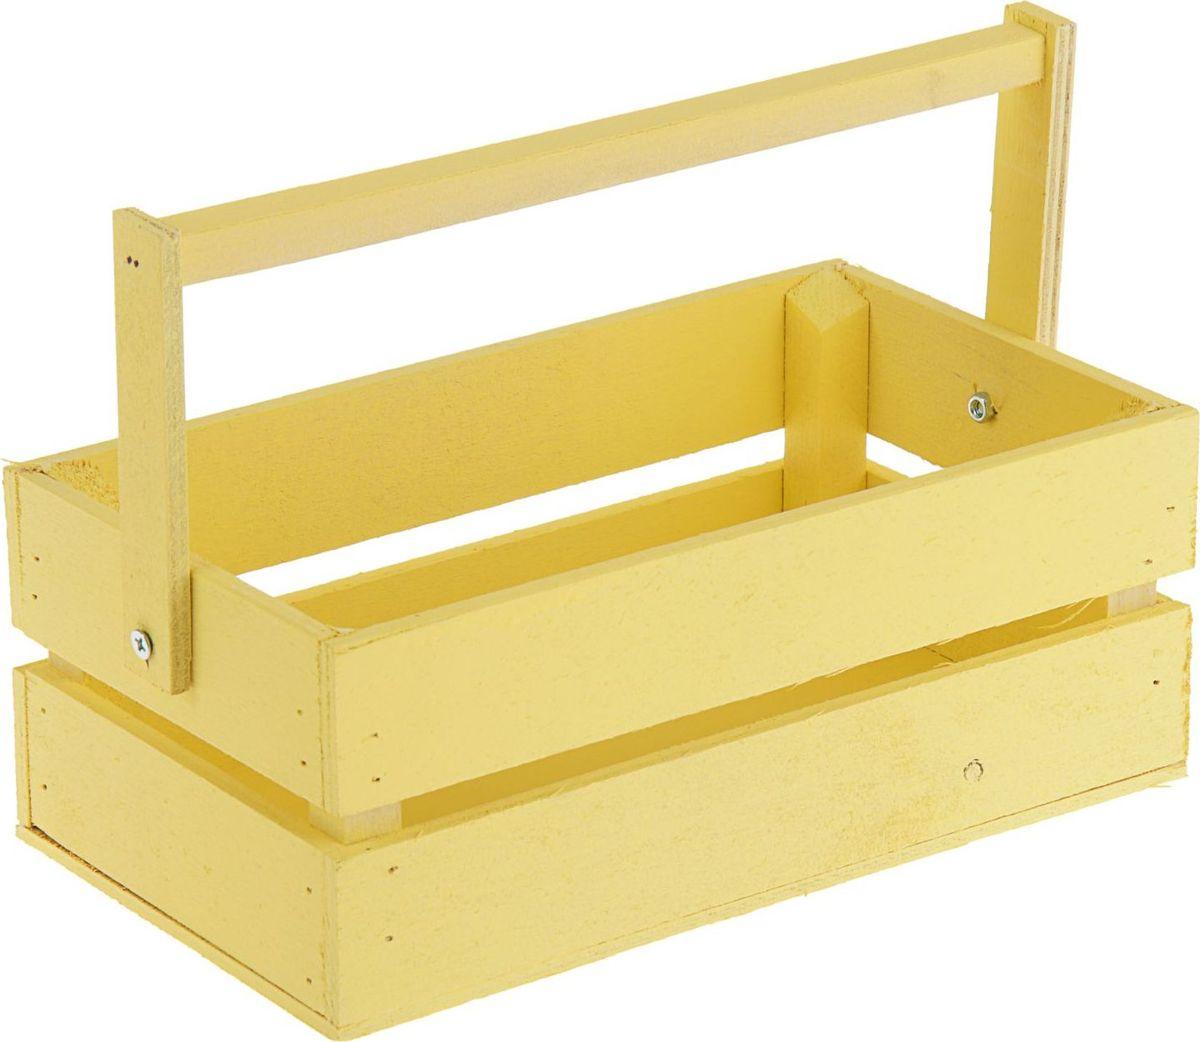 Кашпо ТД ДМ Ящик, со складной ручкой, цвет: желтый, 24,5 х 13,5 х 9 см кашпо тд дм ящик любовь флористическое 20 х 16 х 9 5 см